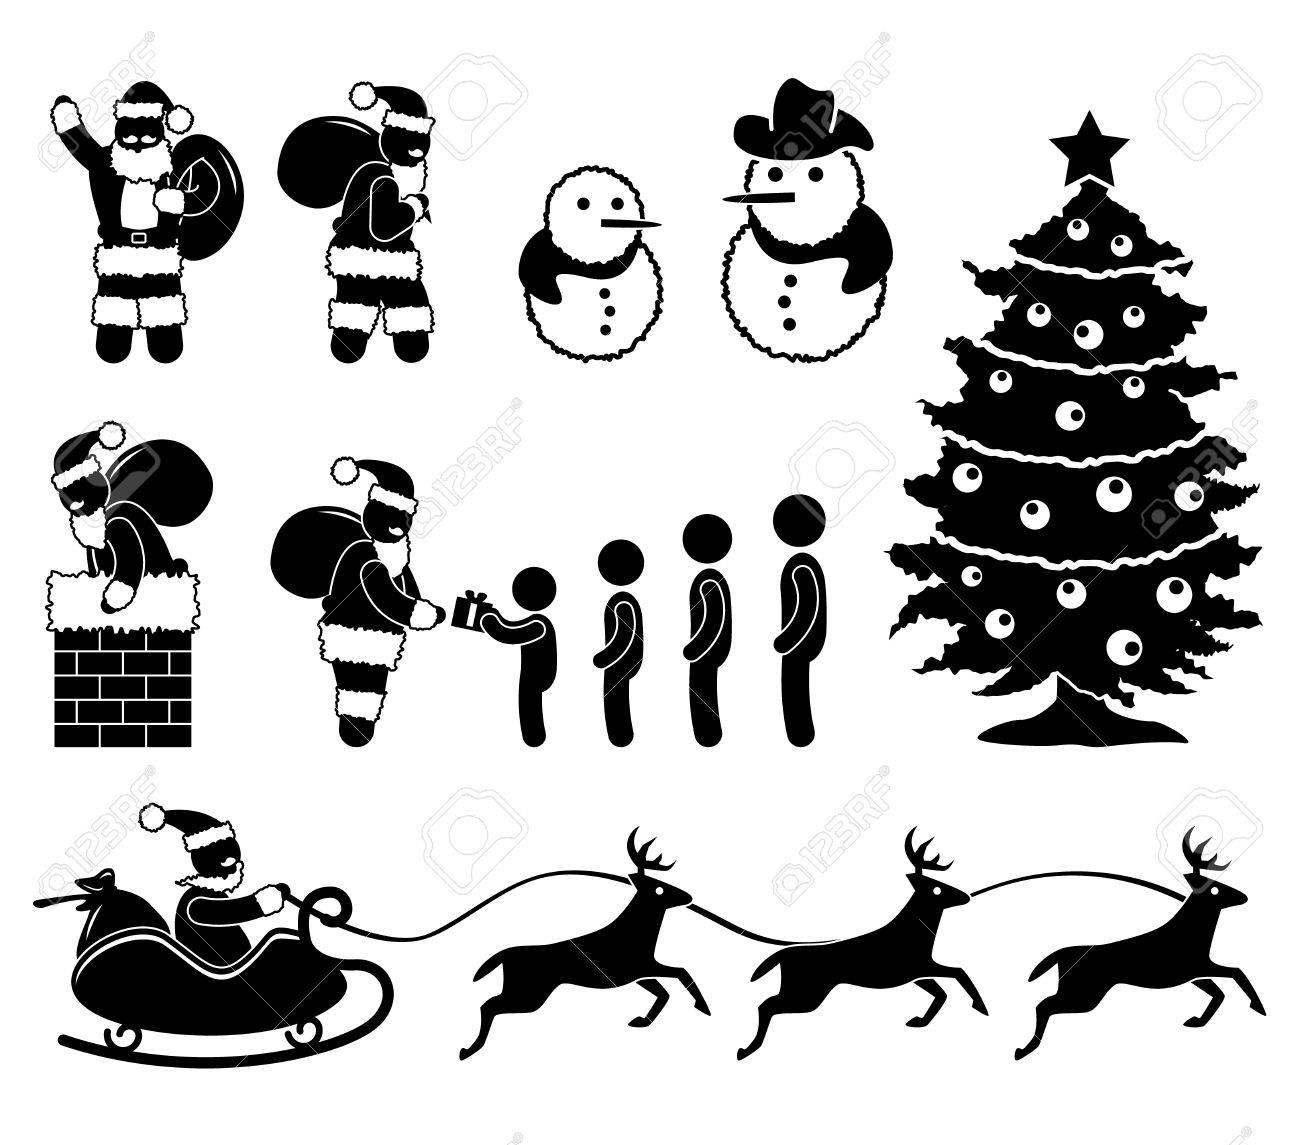 Christmas Santa Claus Snowman Winter Chimney Reindeer Stock Vector - 11102684